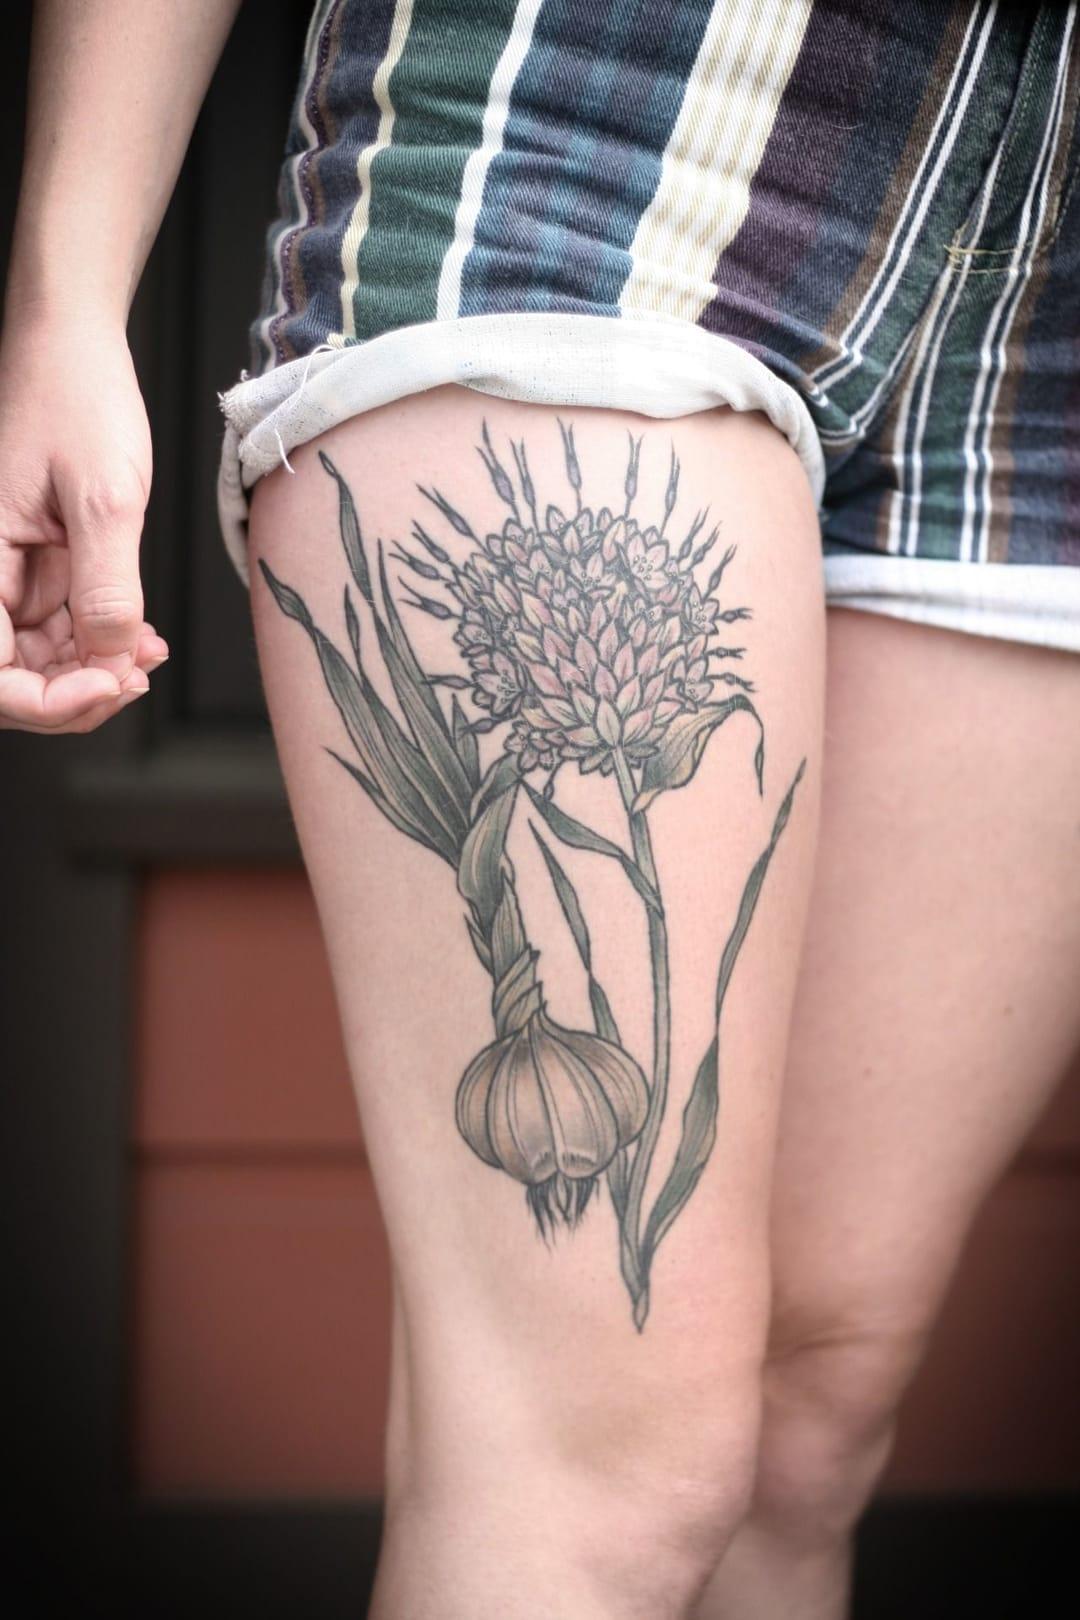 Shallot tattoo by Kirsten Holliday from Wonderland Tattoo, Portland, Oregon.